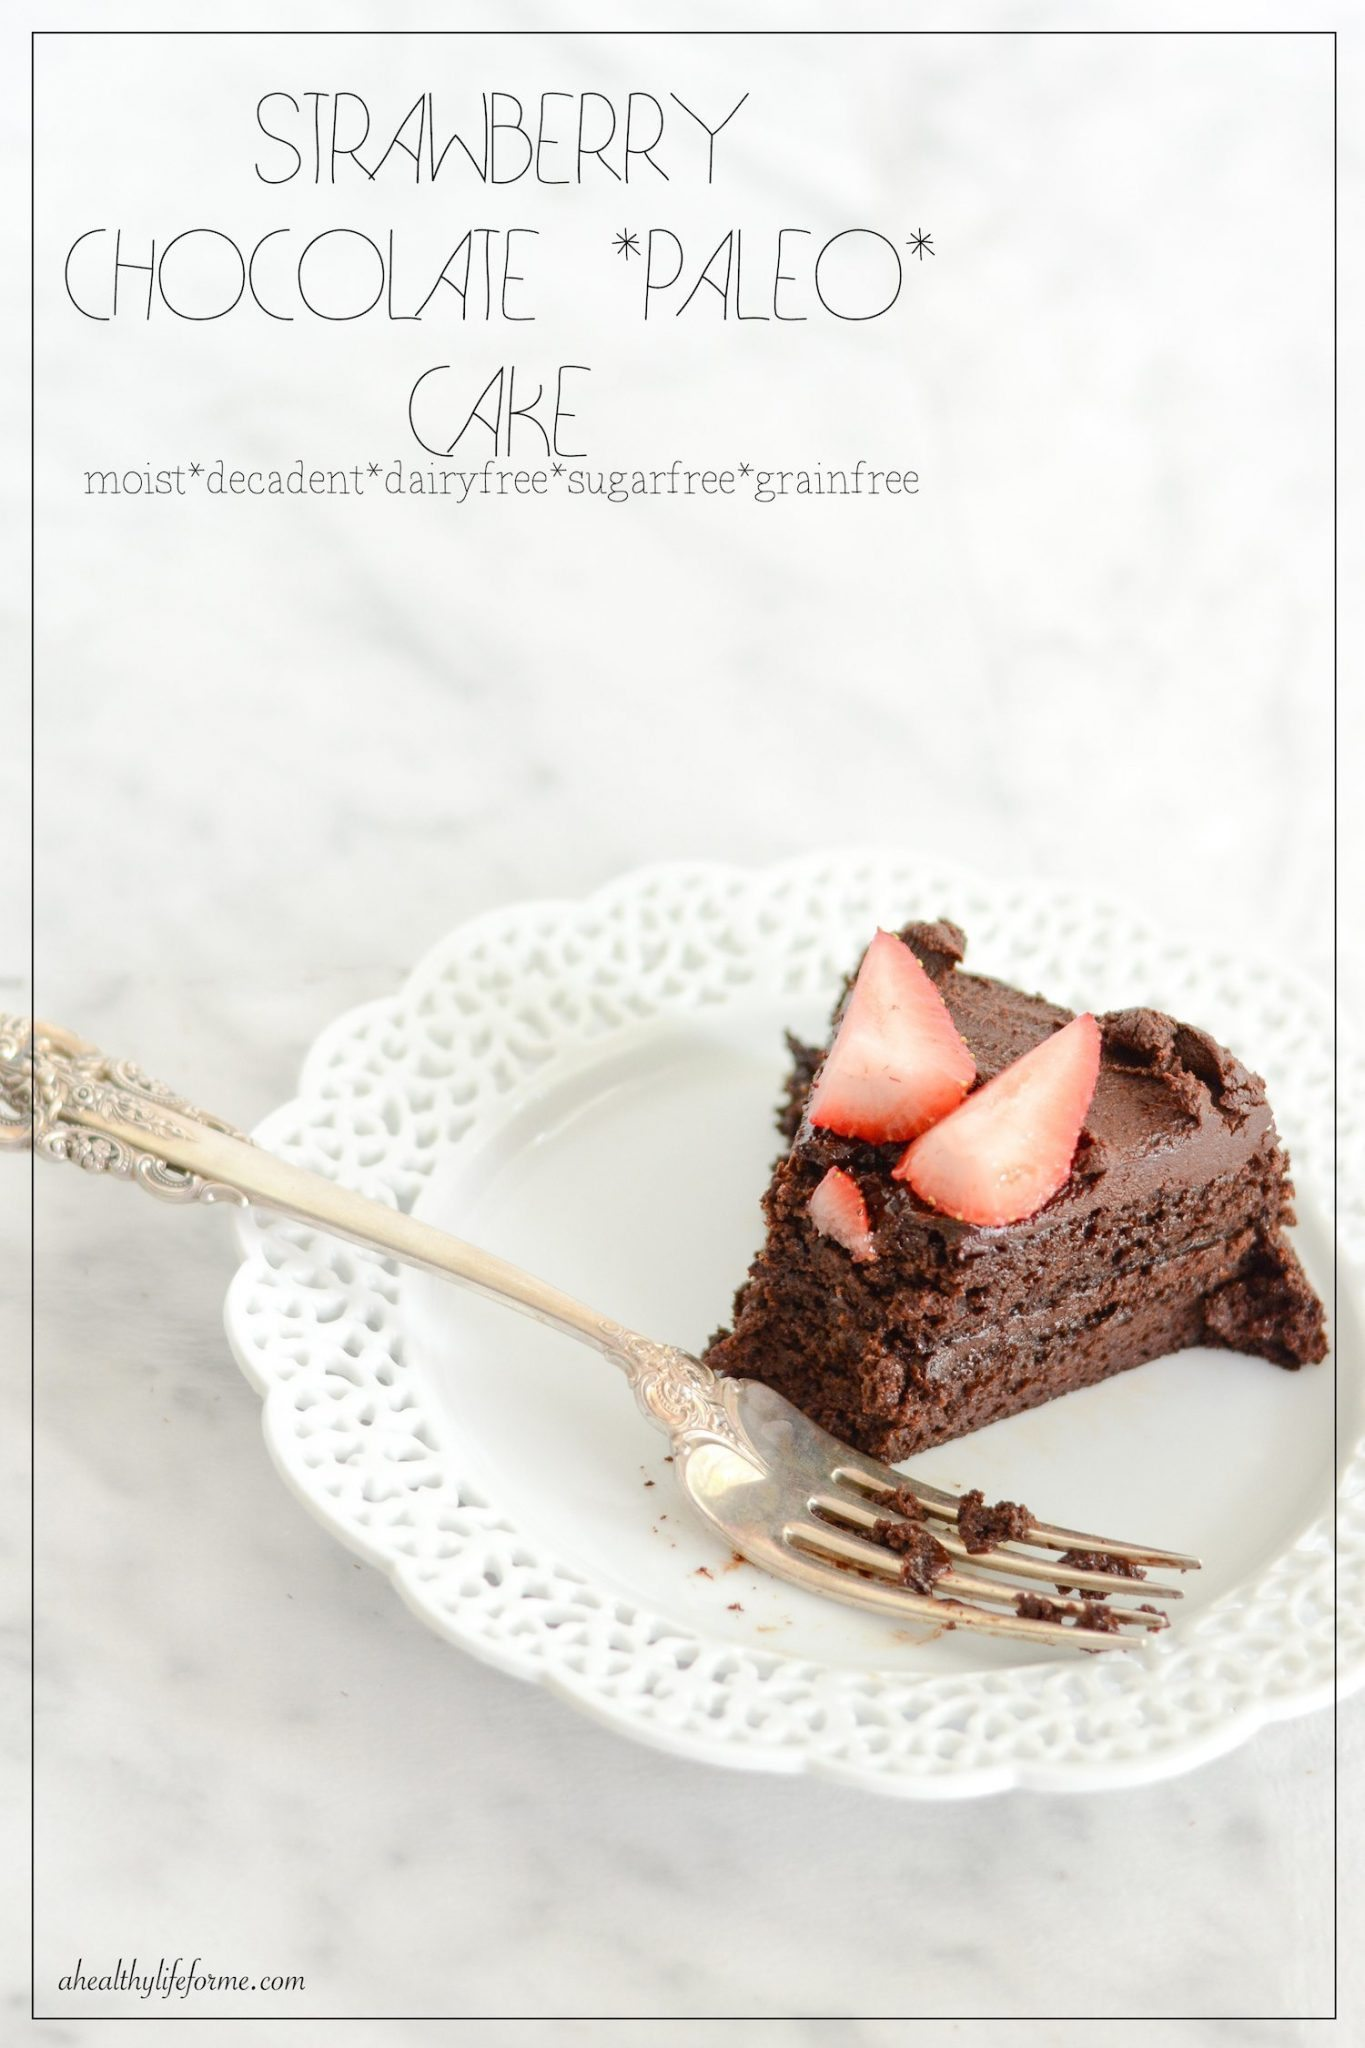 Strawberry Chocolate Paleo Cake